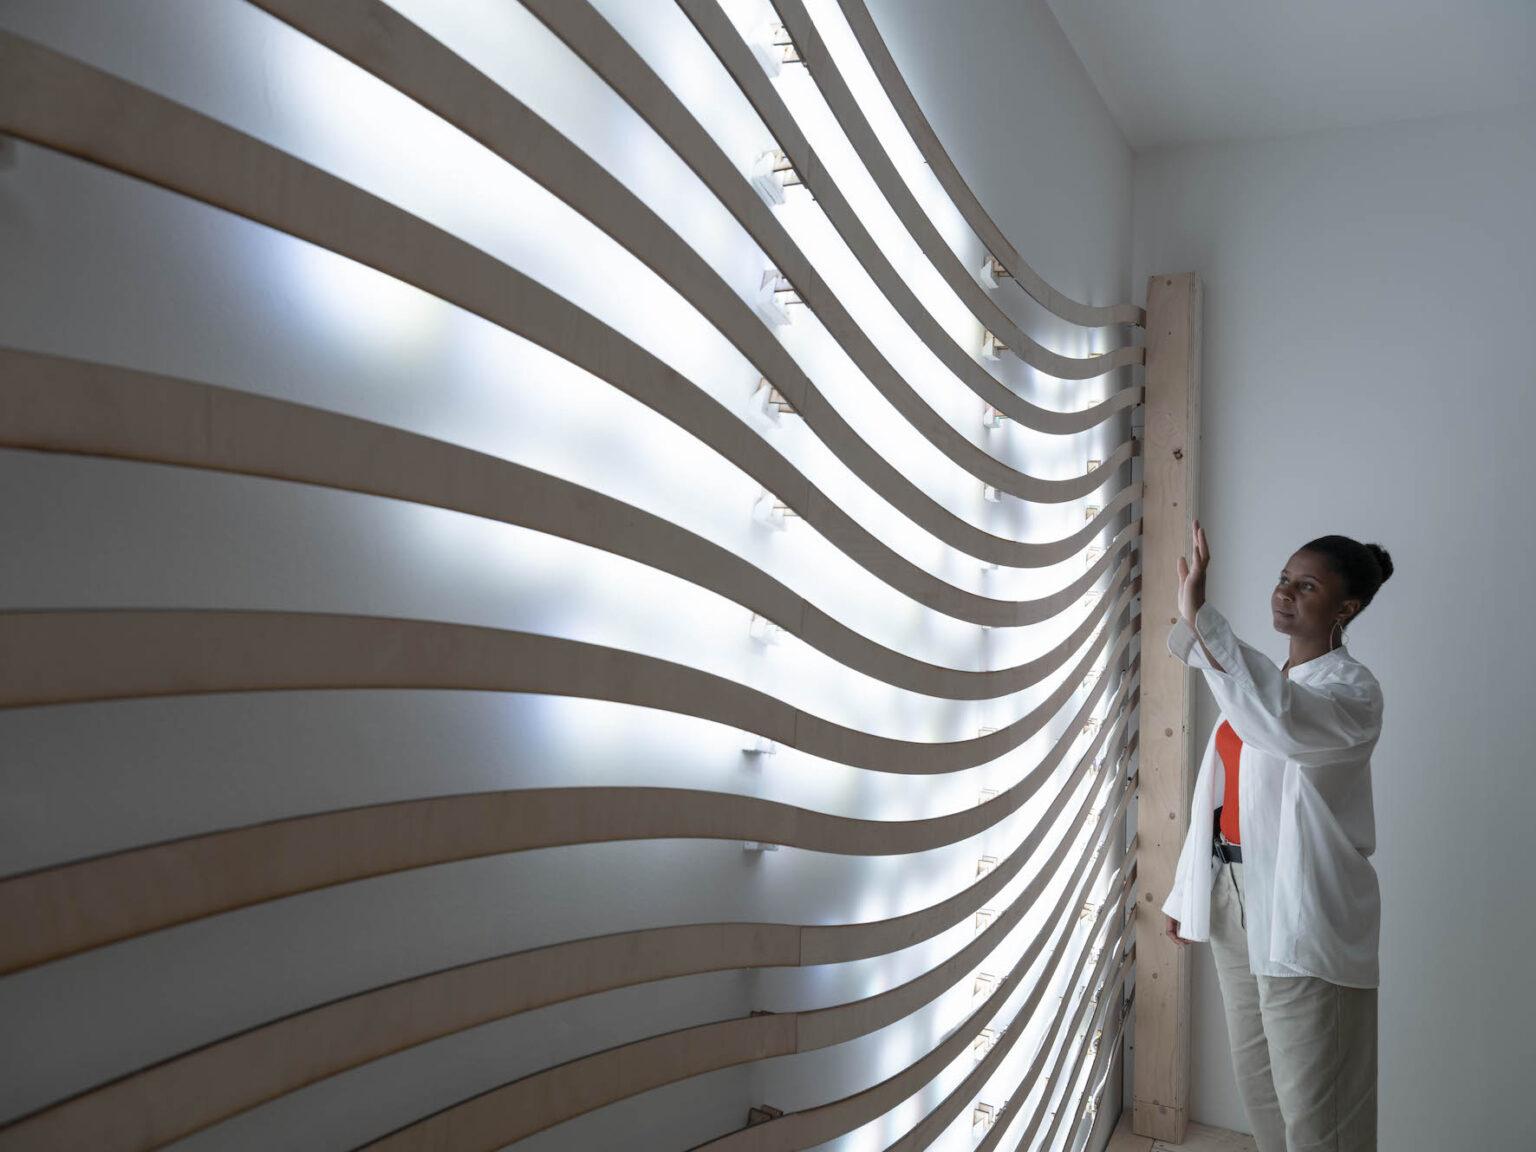 The artist stands beside a wavy sculptural wall installation, backlit.